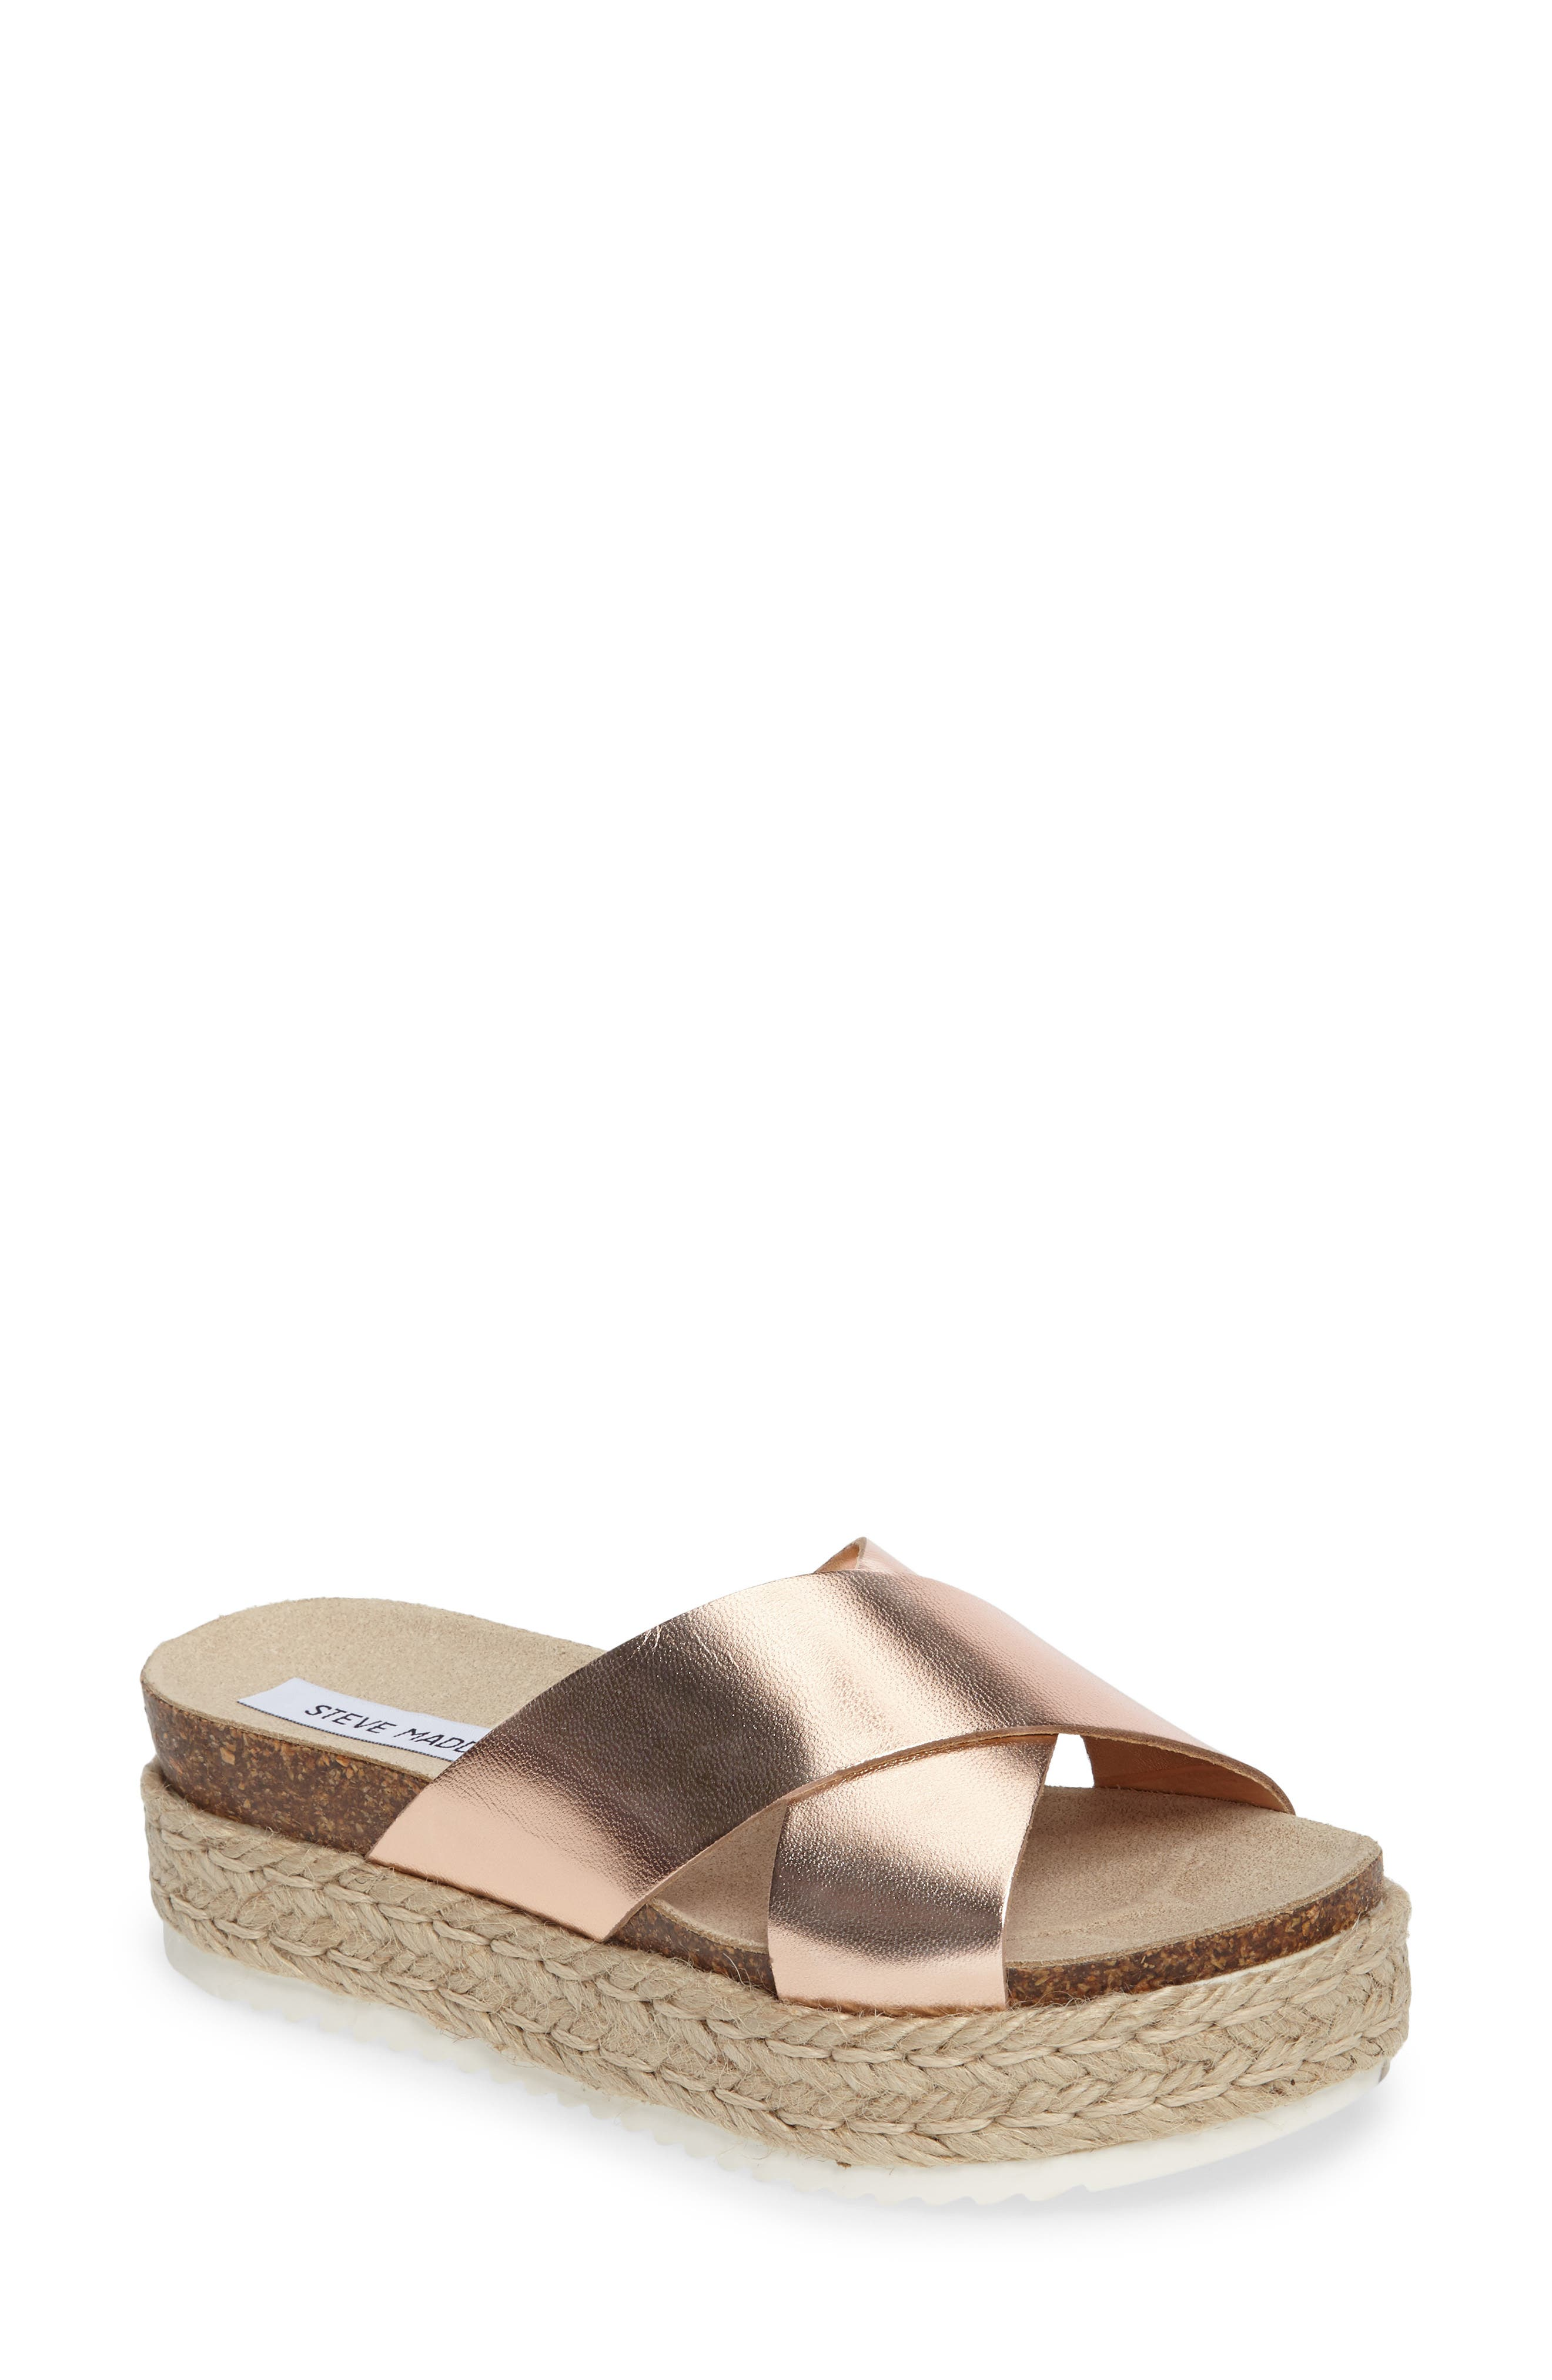 Alternate Image 1 Selected - Steve Madden 'Arran' Espadrille Platform Sandal (Women)